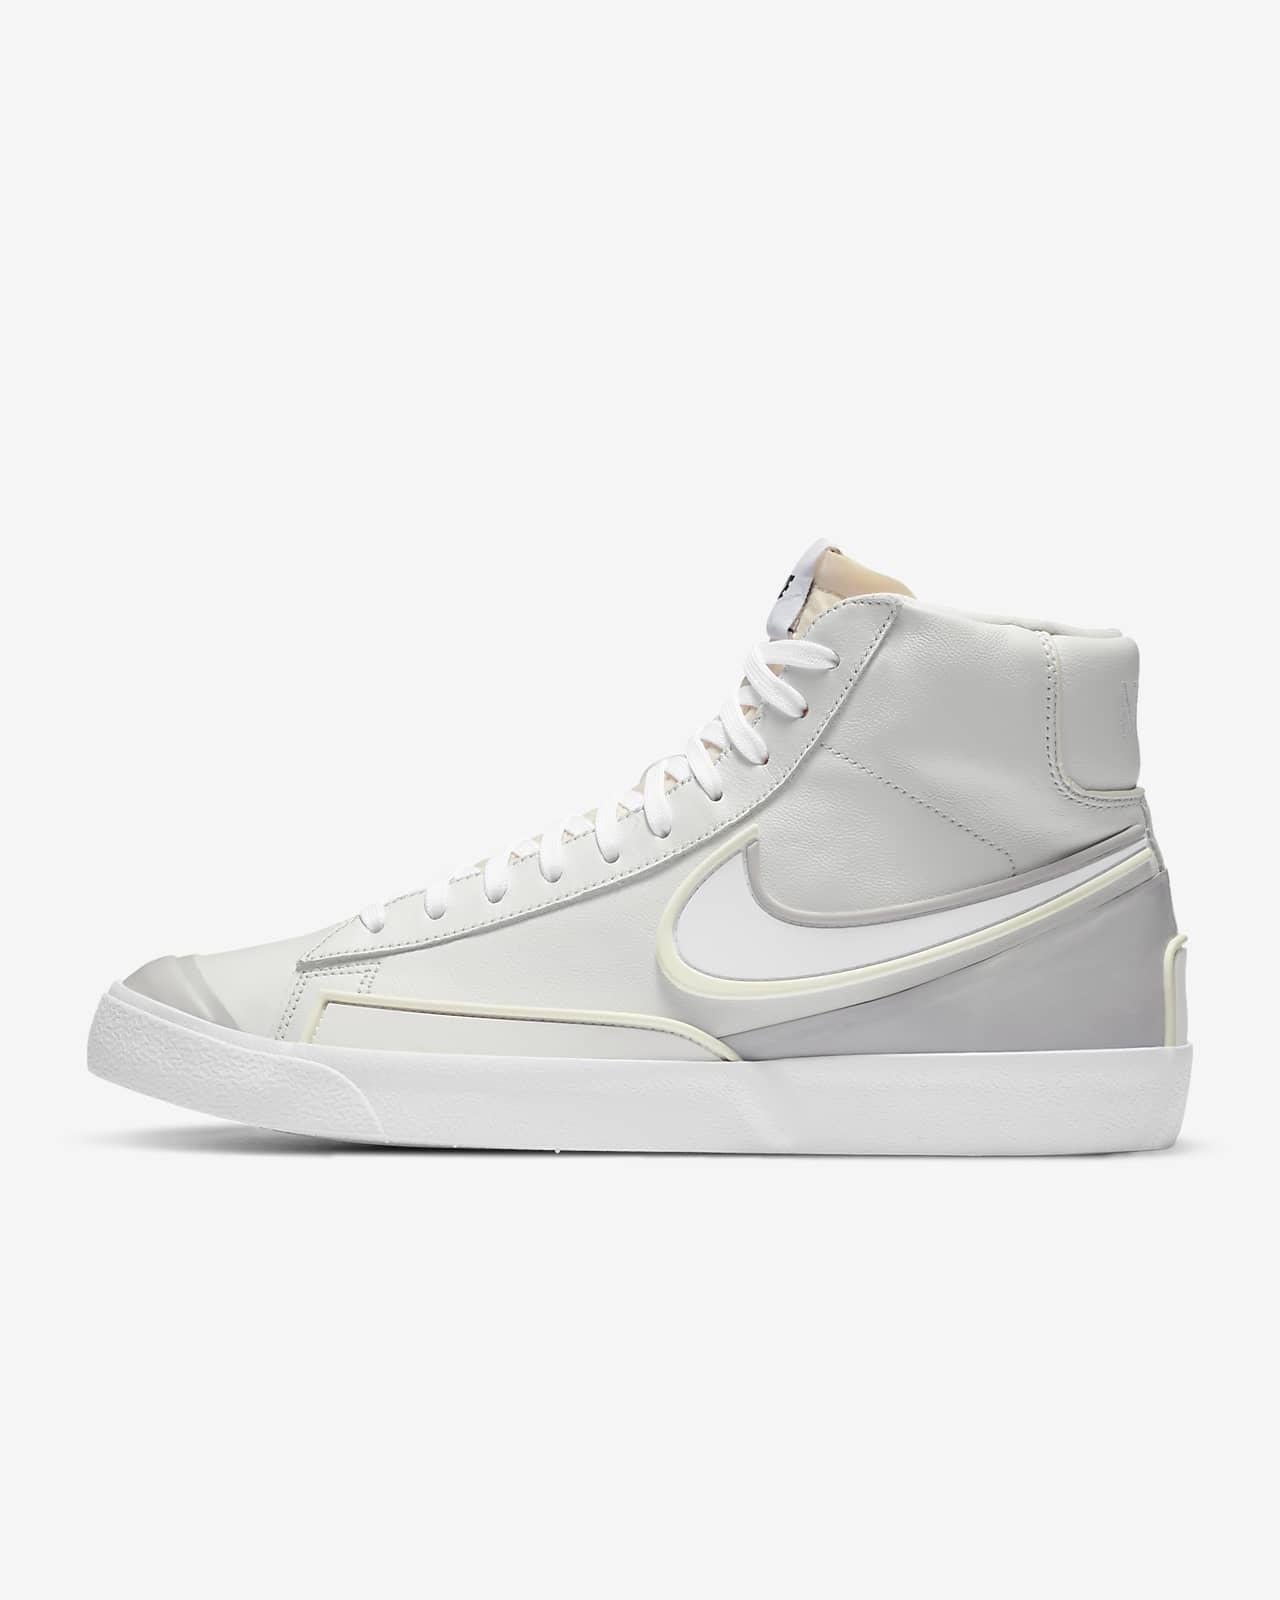 Nike Blazer Mid '77 Infinite 男子运动鞋